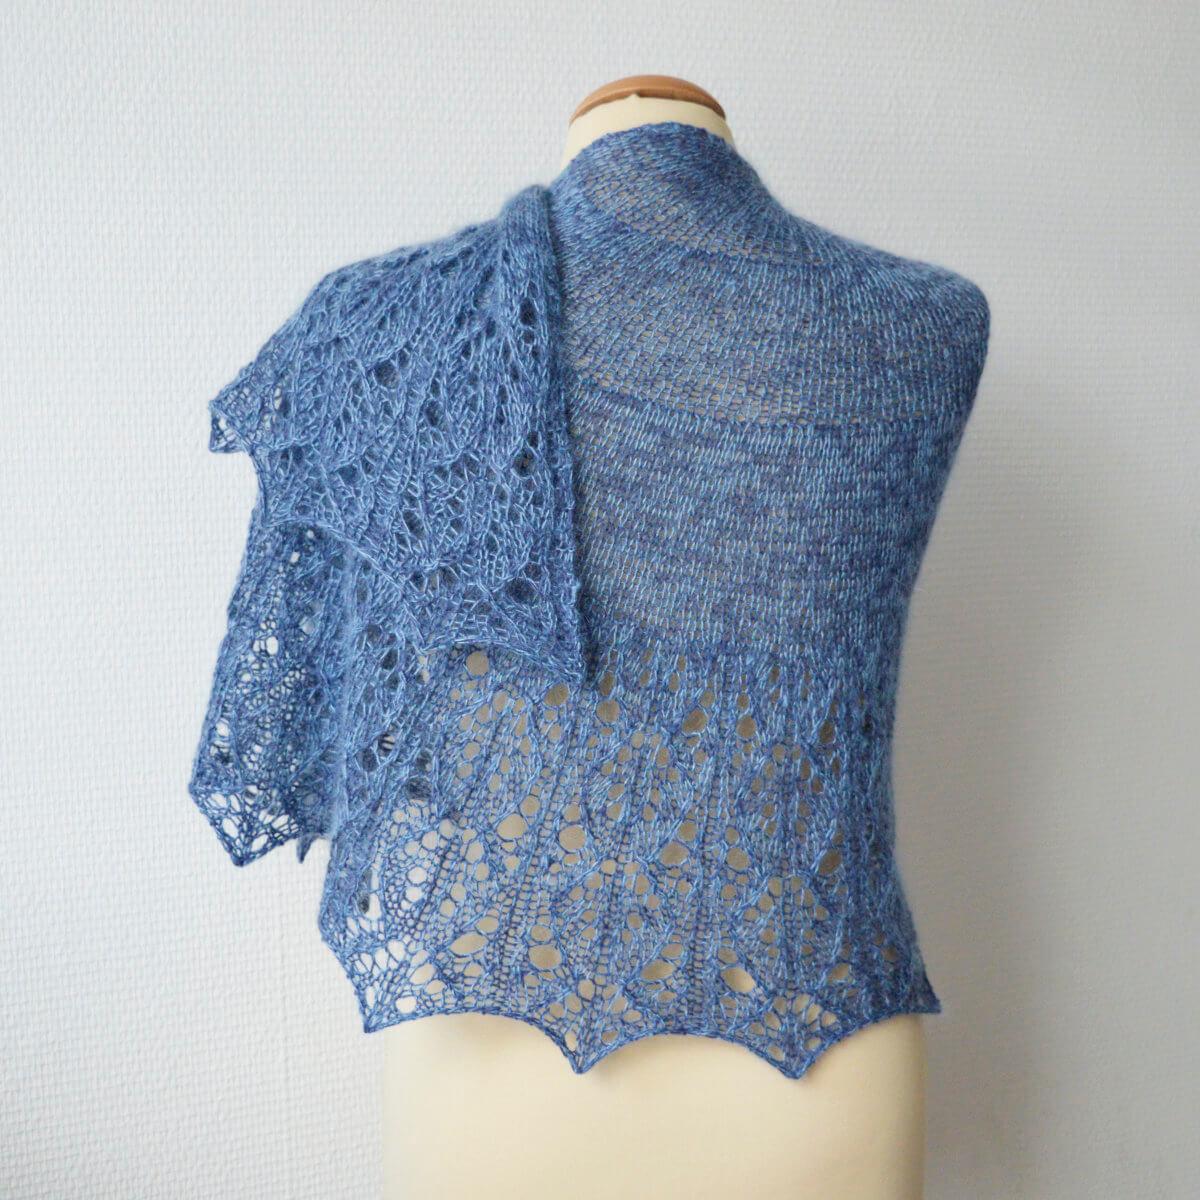 Ochtend Mist shawl